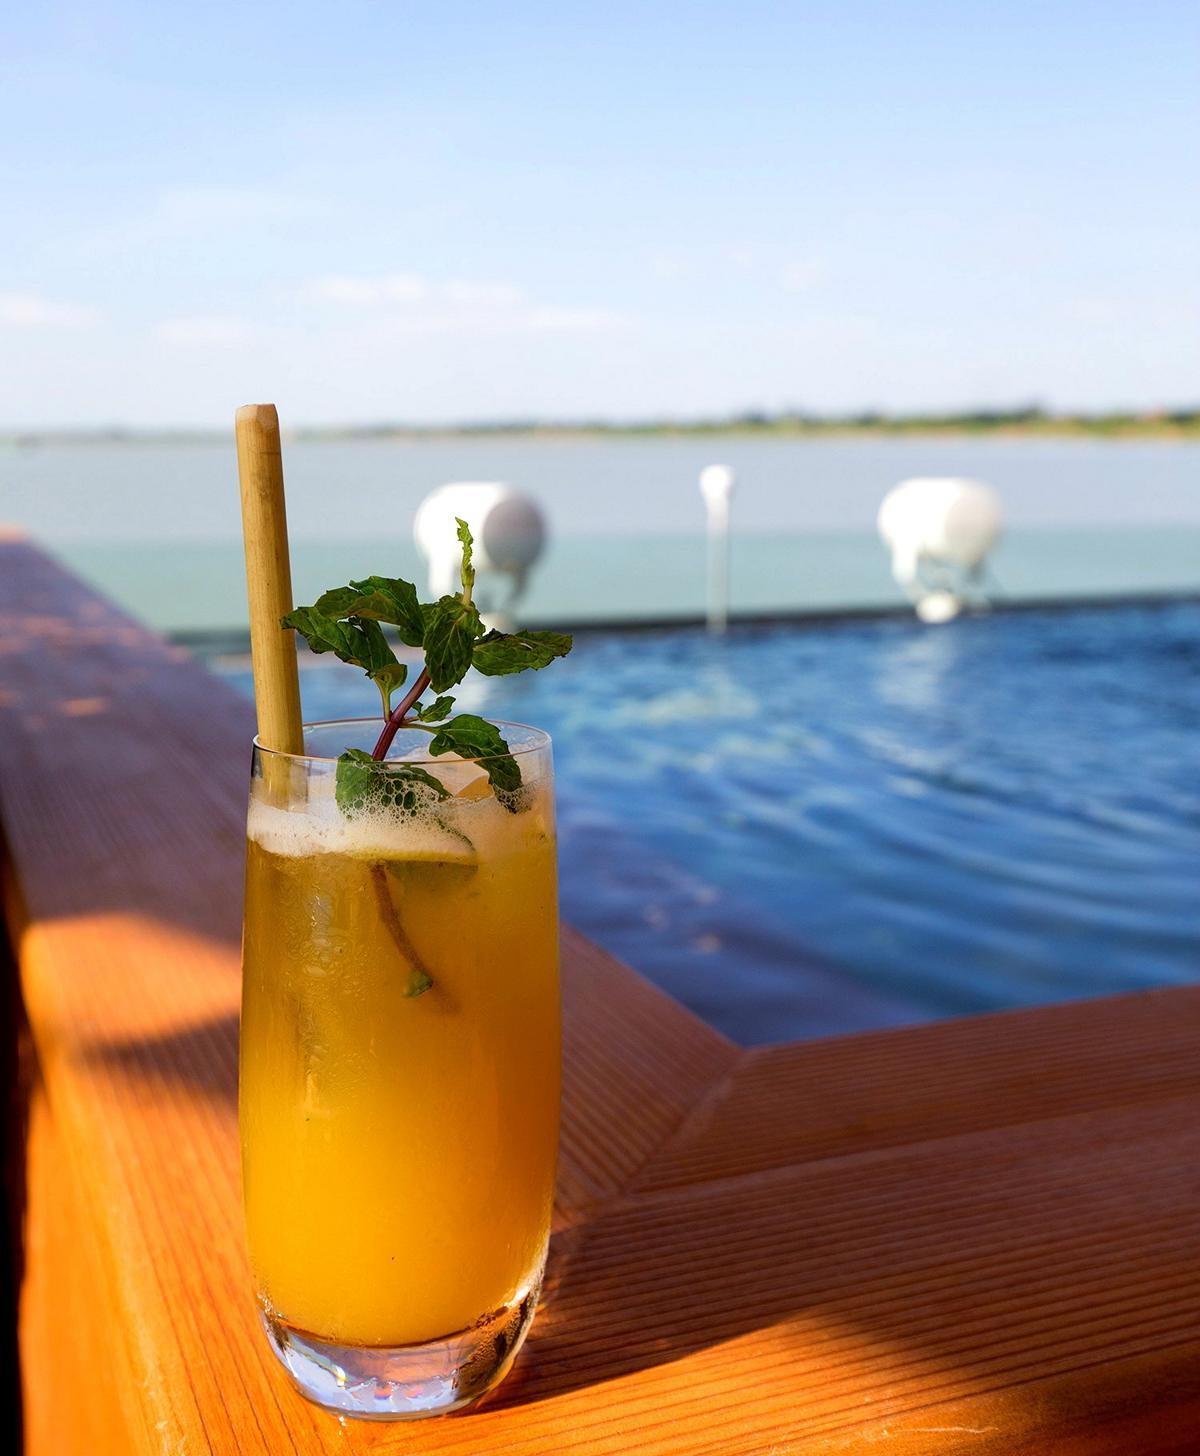 Cocktail am Pool der Aqua Mekong in Kambodscha